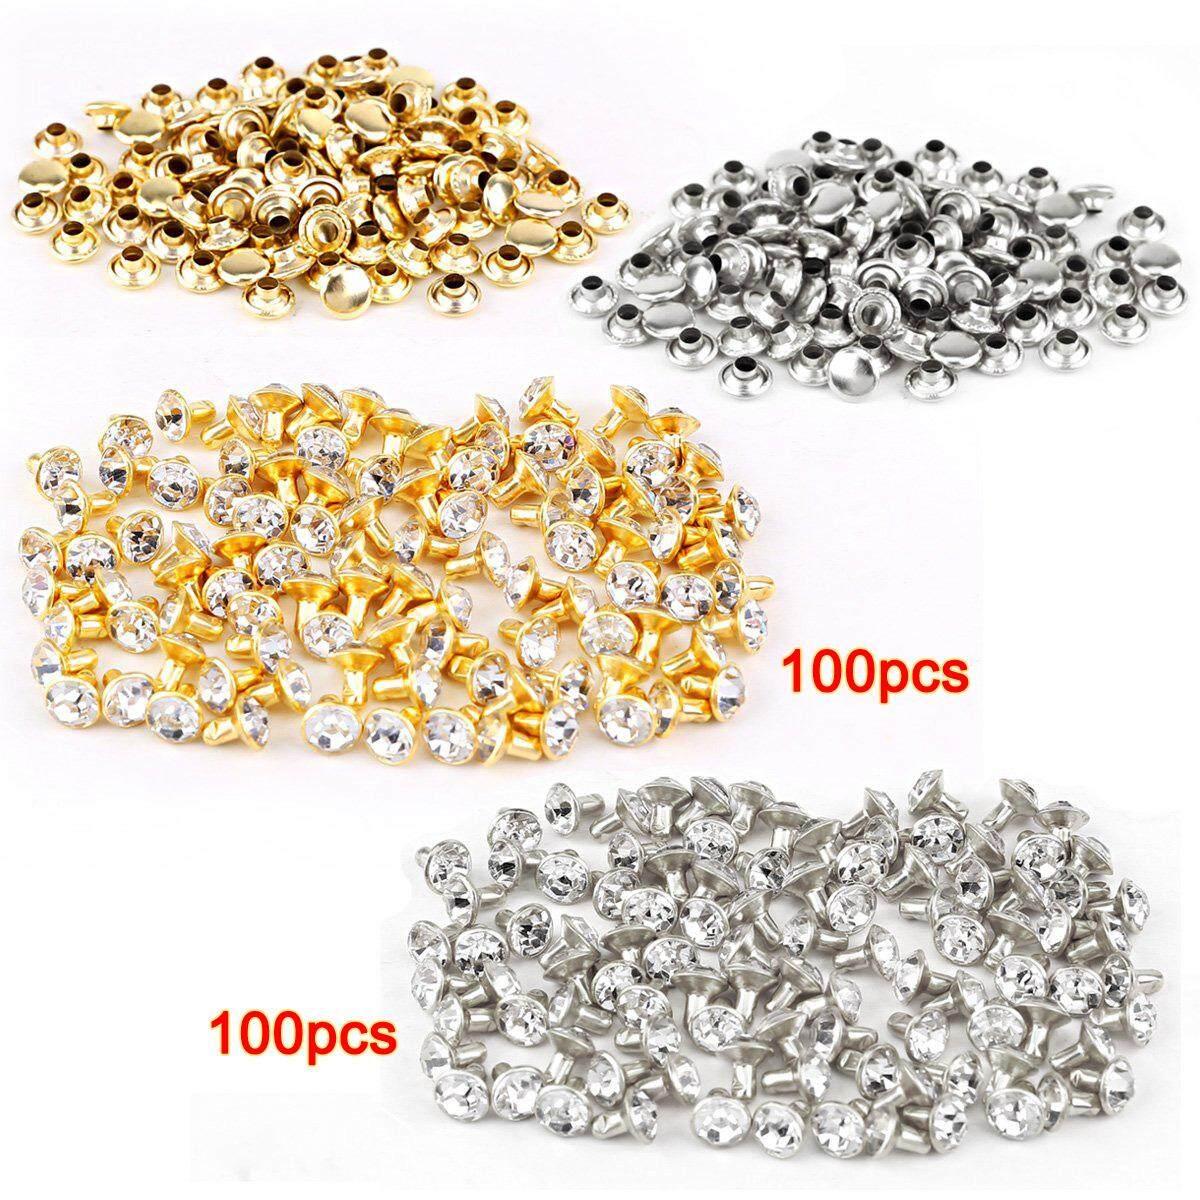 100pcs silver + 100 pcs golden Rivet with rhinestone diamond 7mm